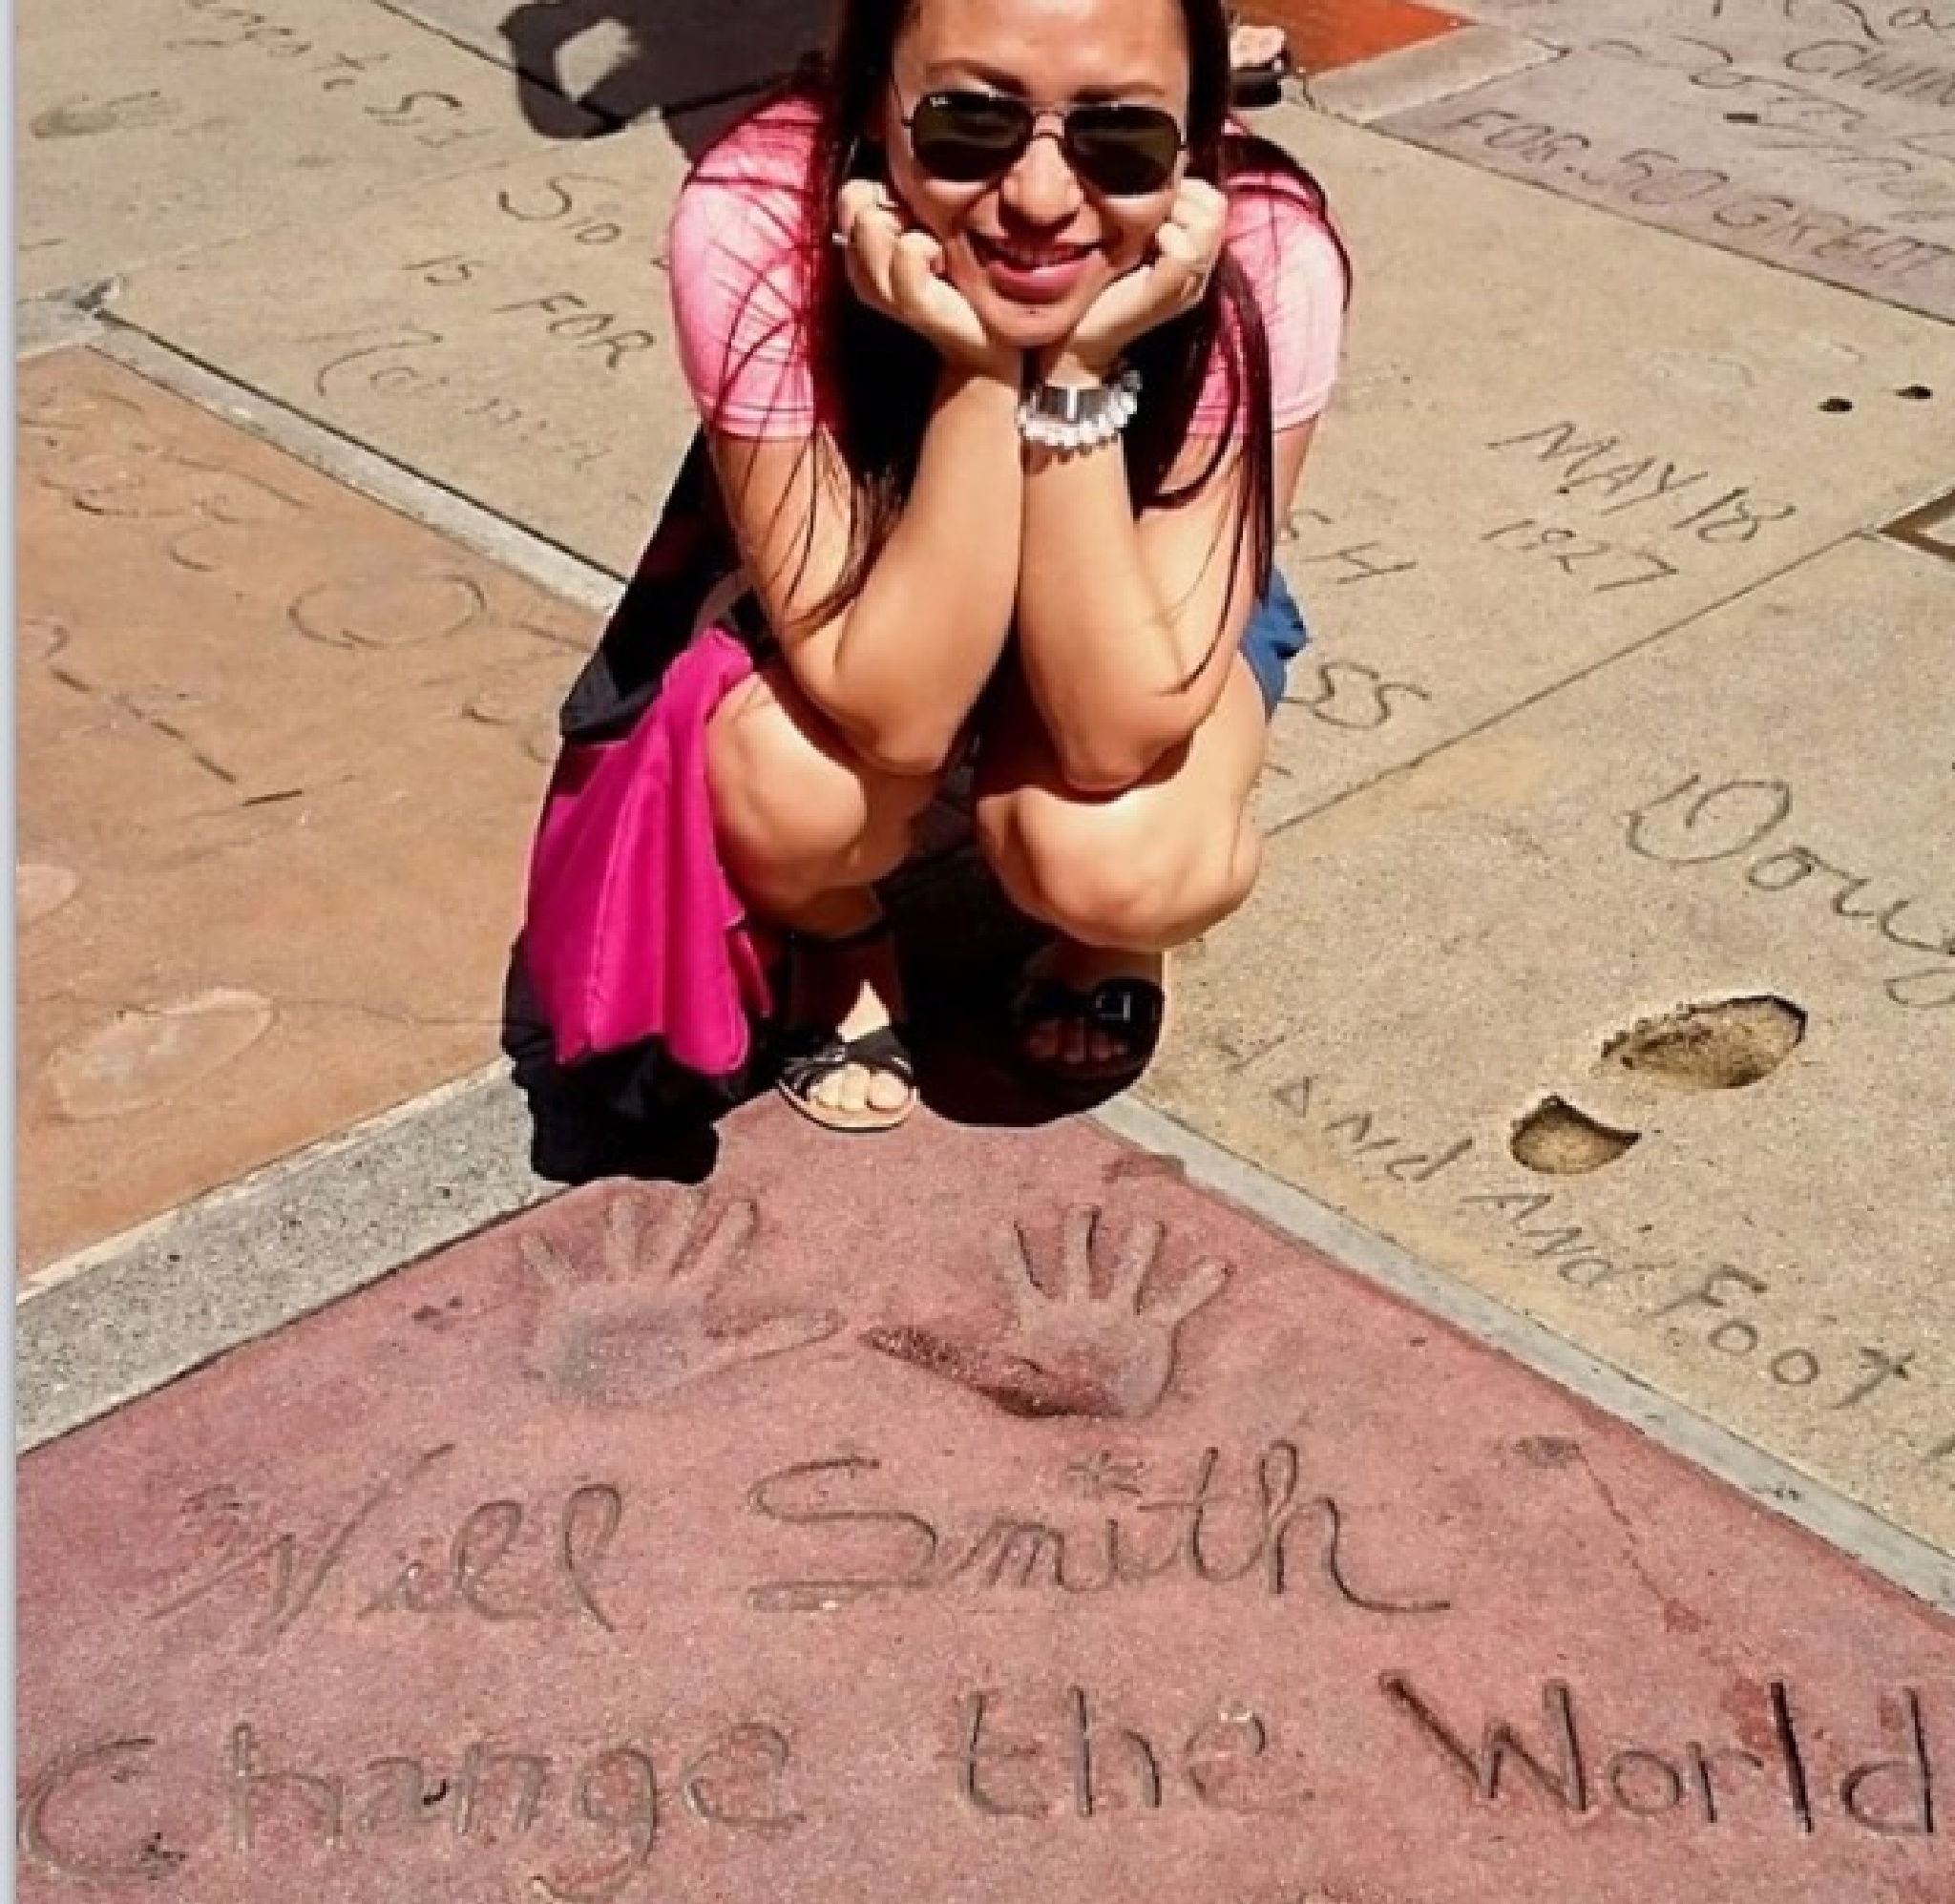 Cristel at walk of fame by jimbo.velasquez.1